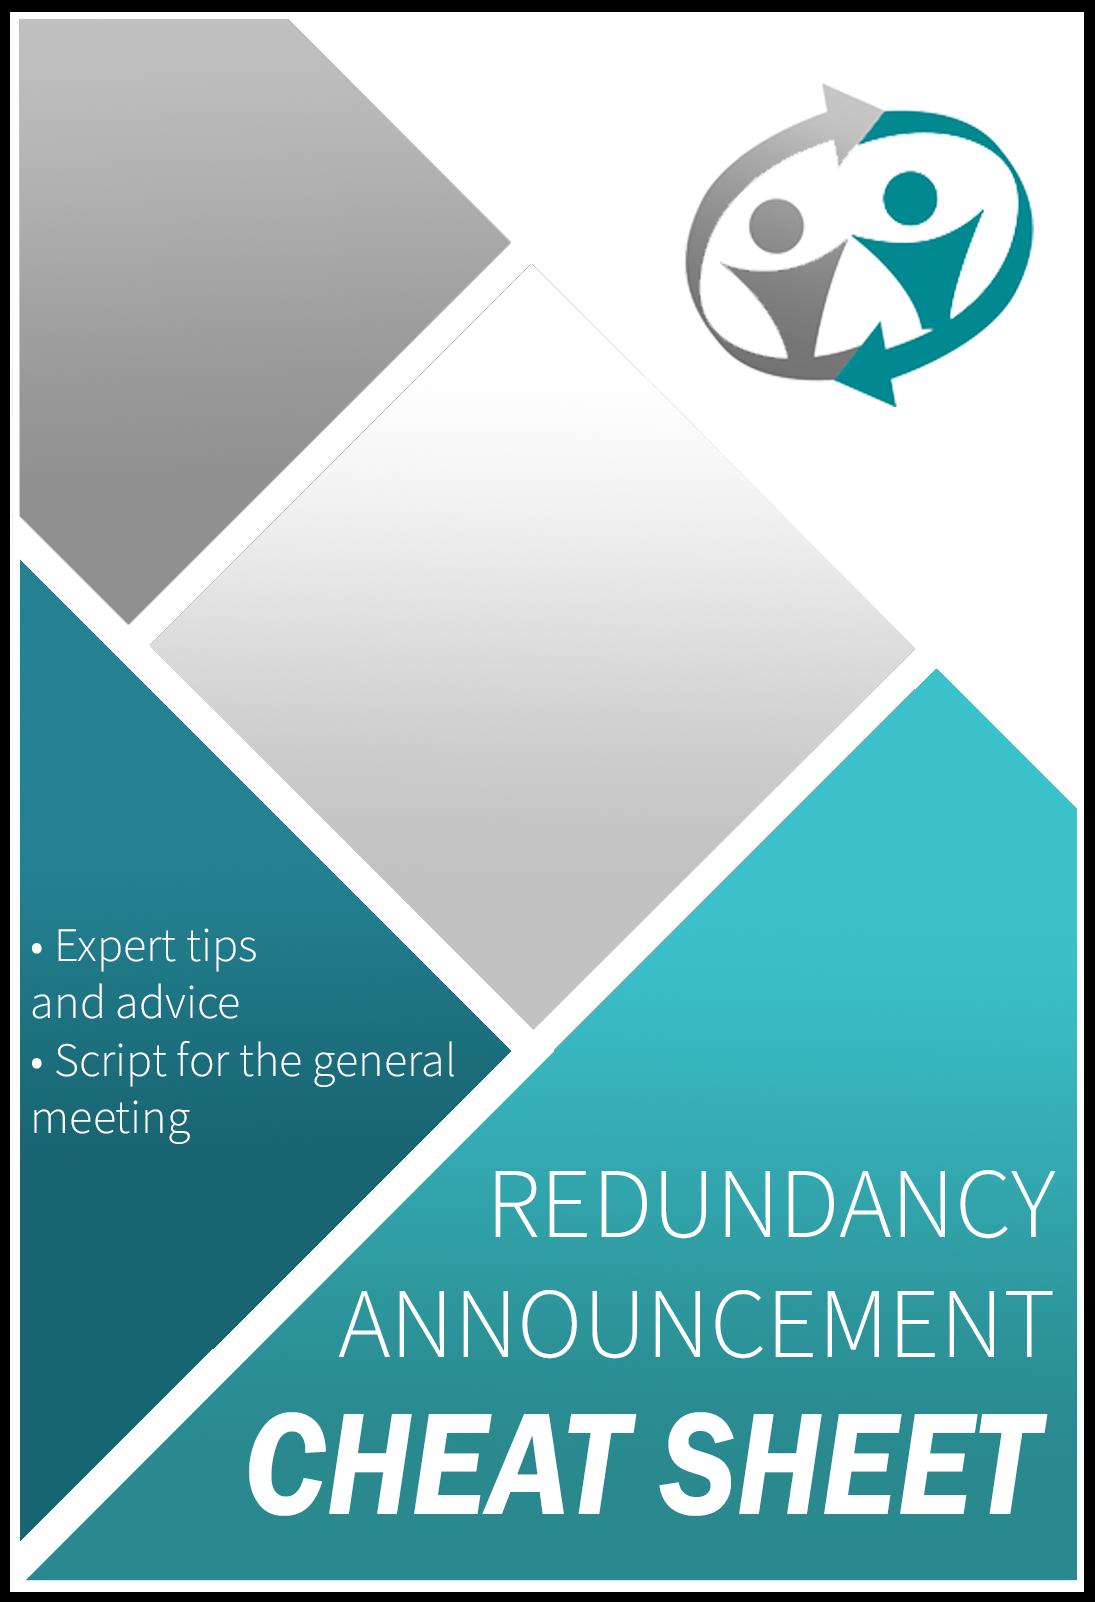 redundancy announcement